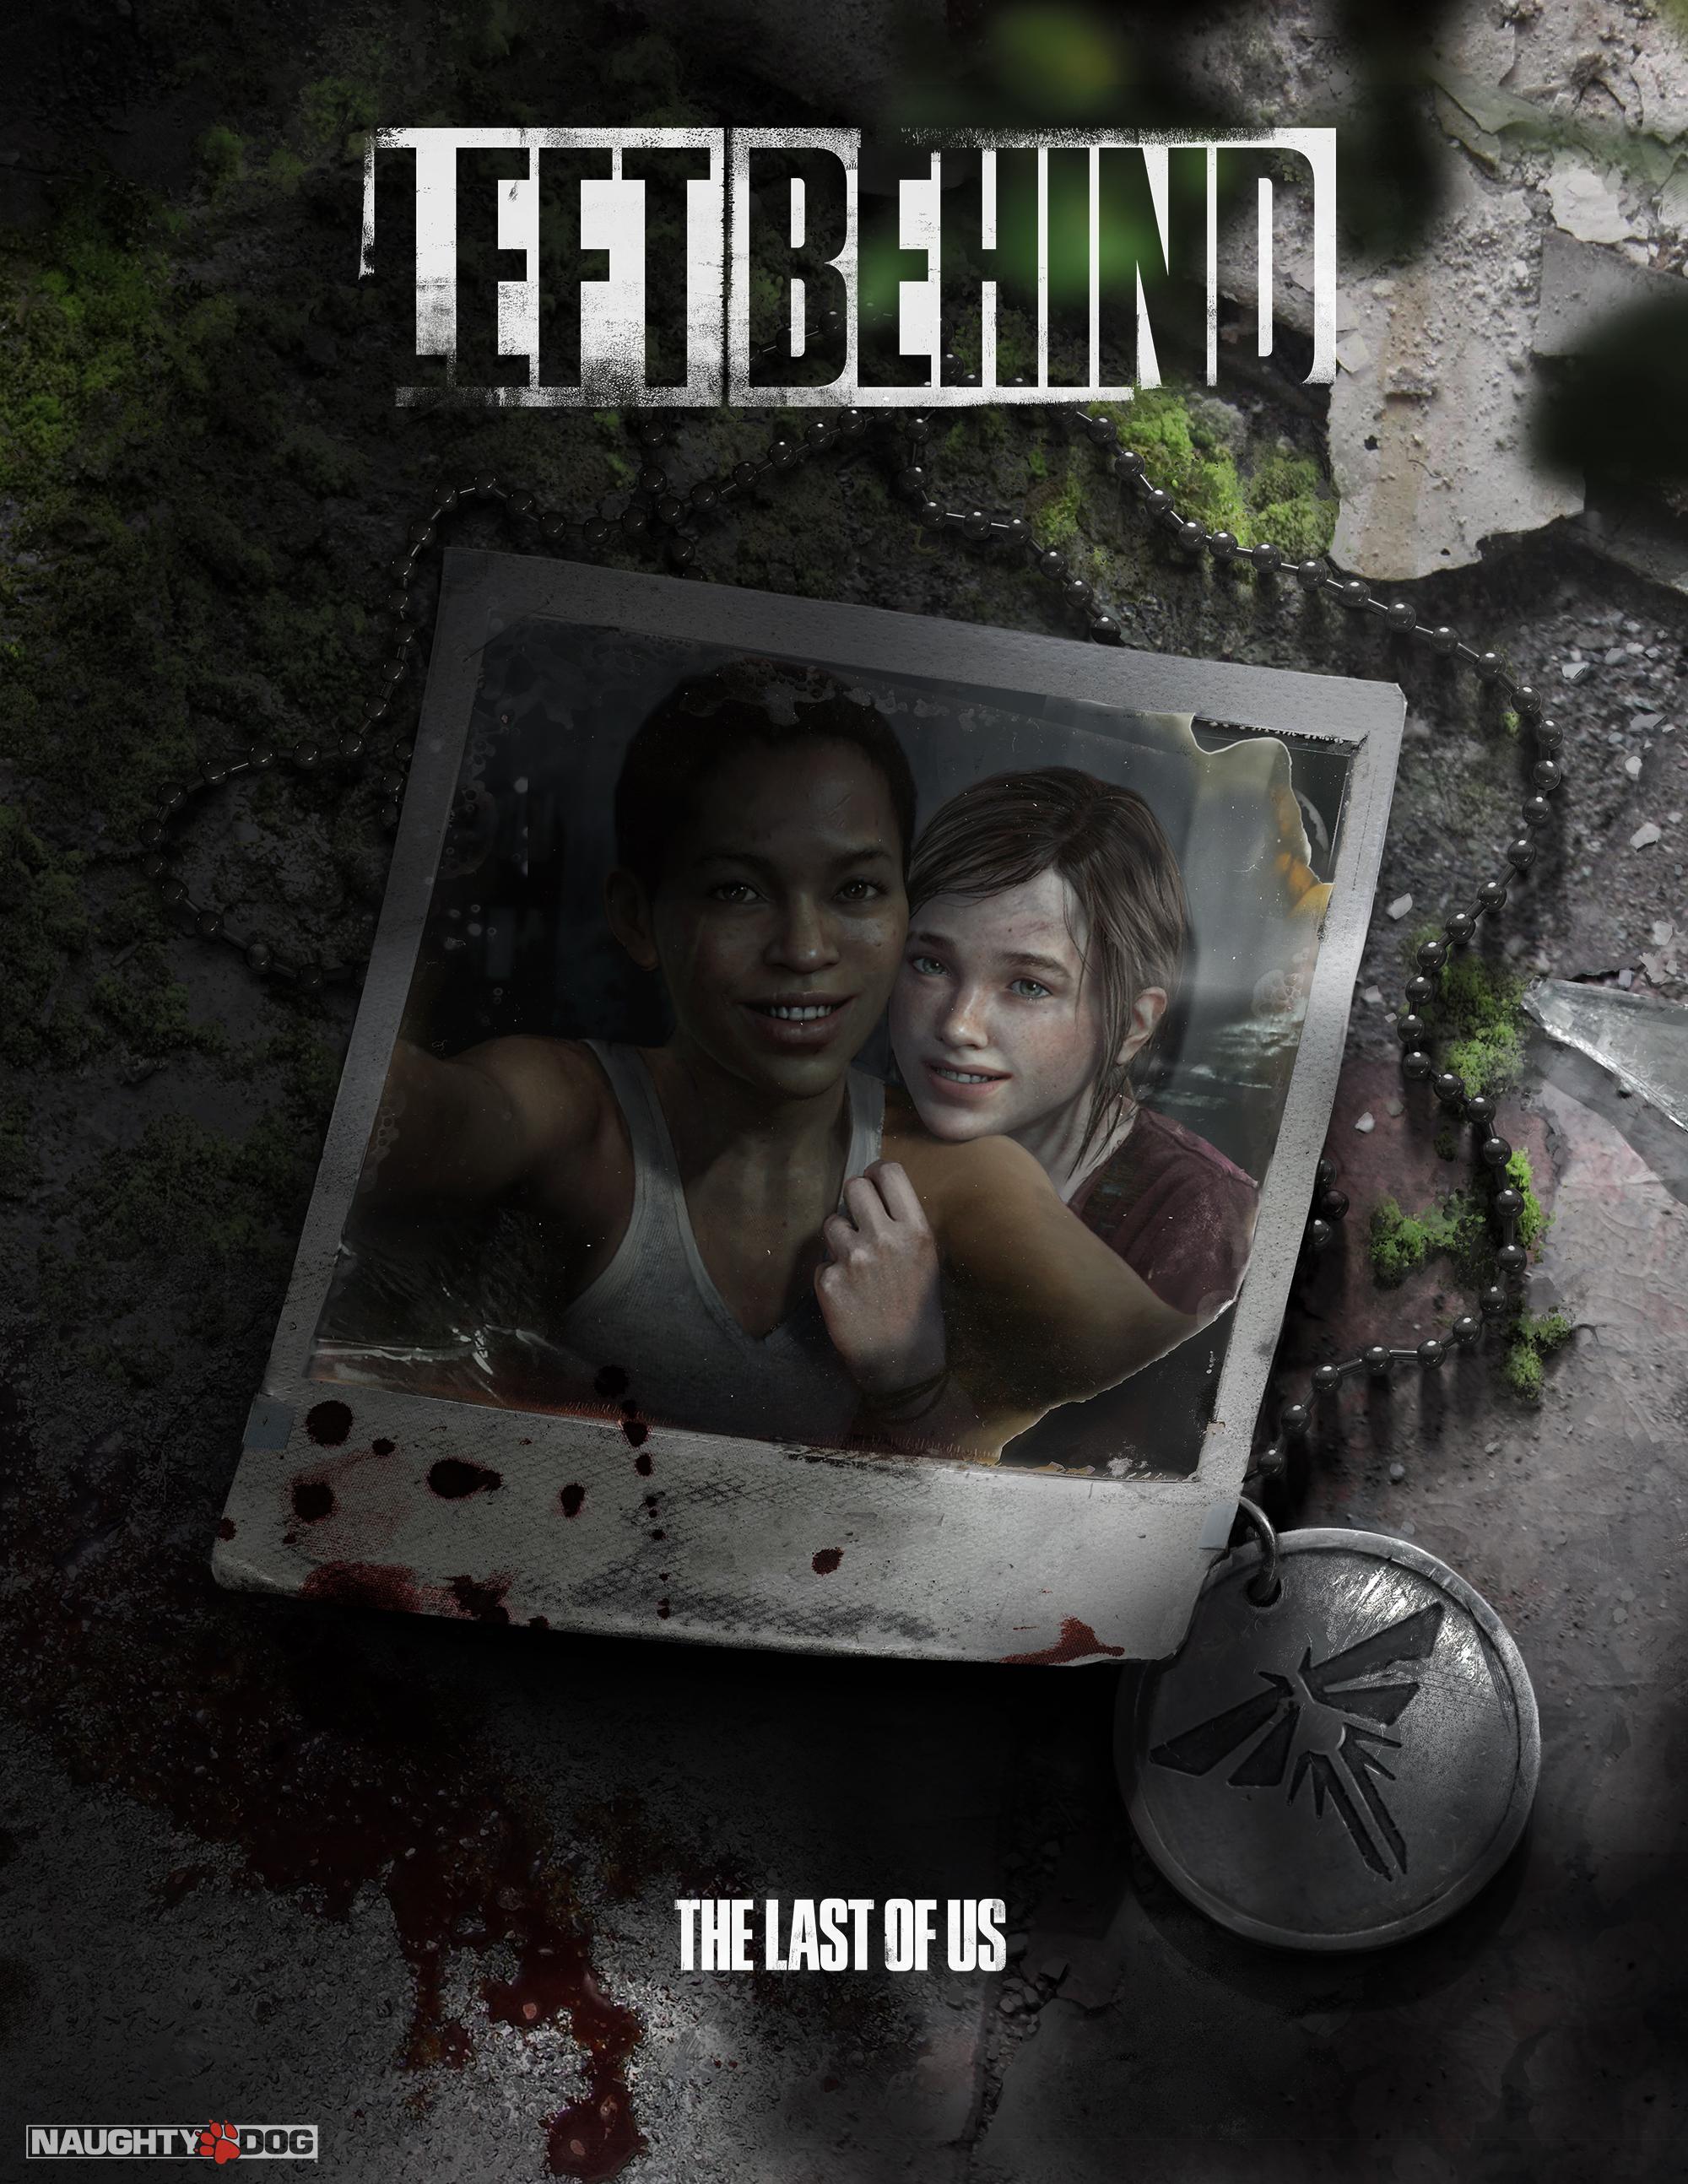 thelastofus_leftbehind